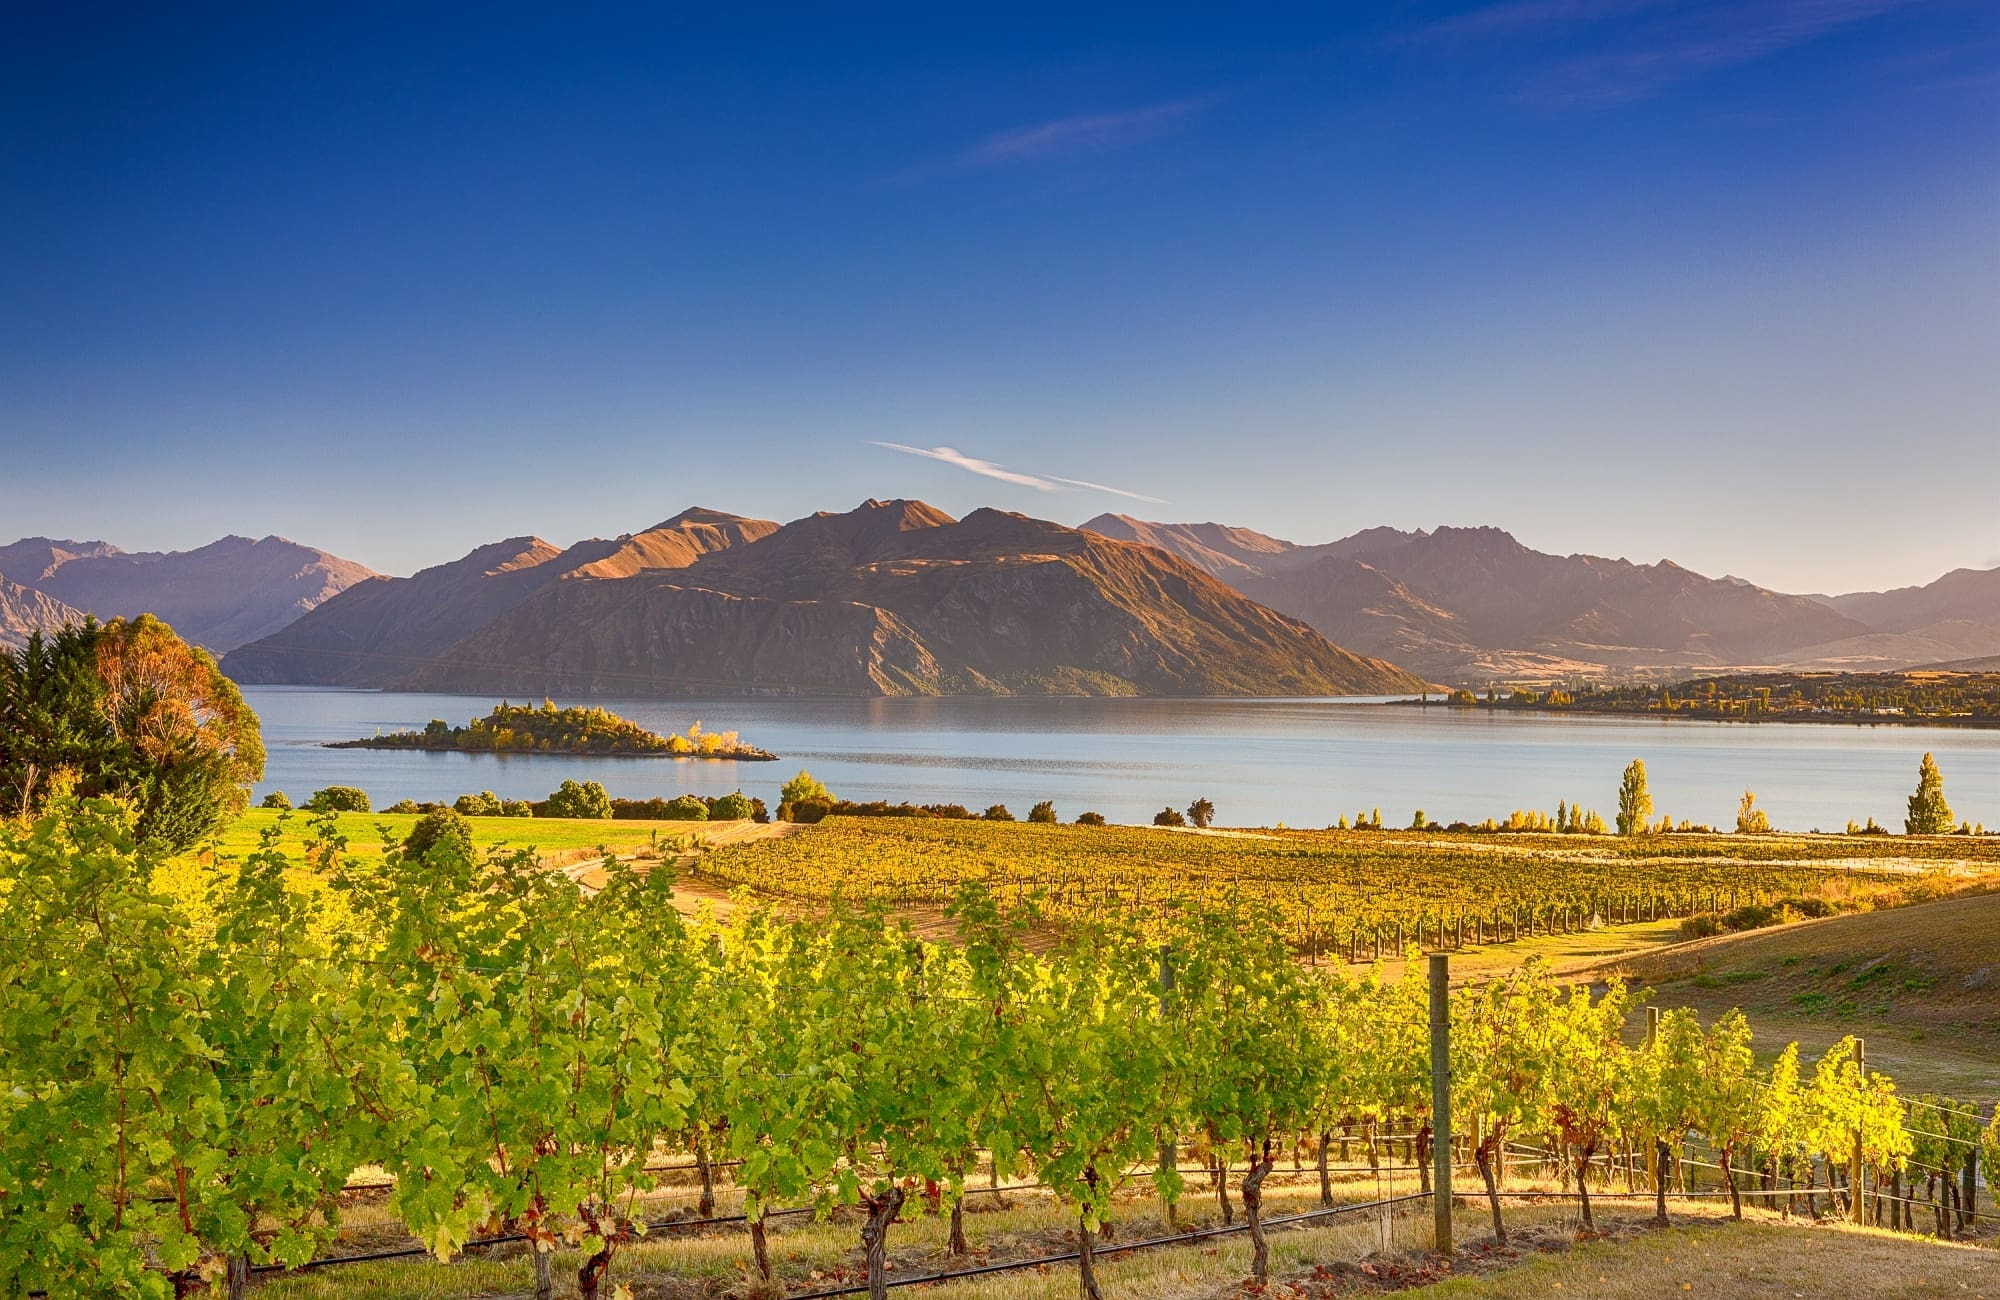 De jolis vignobles entourant le lac Wanaka.